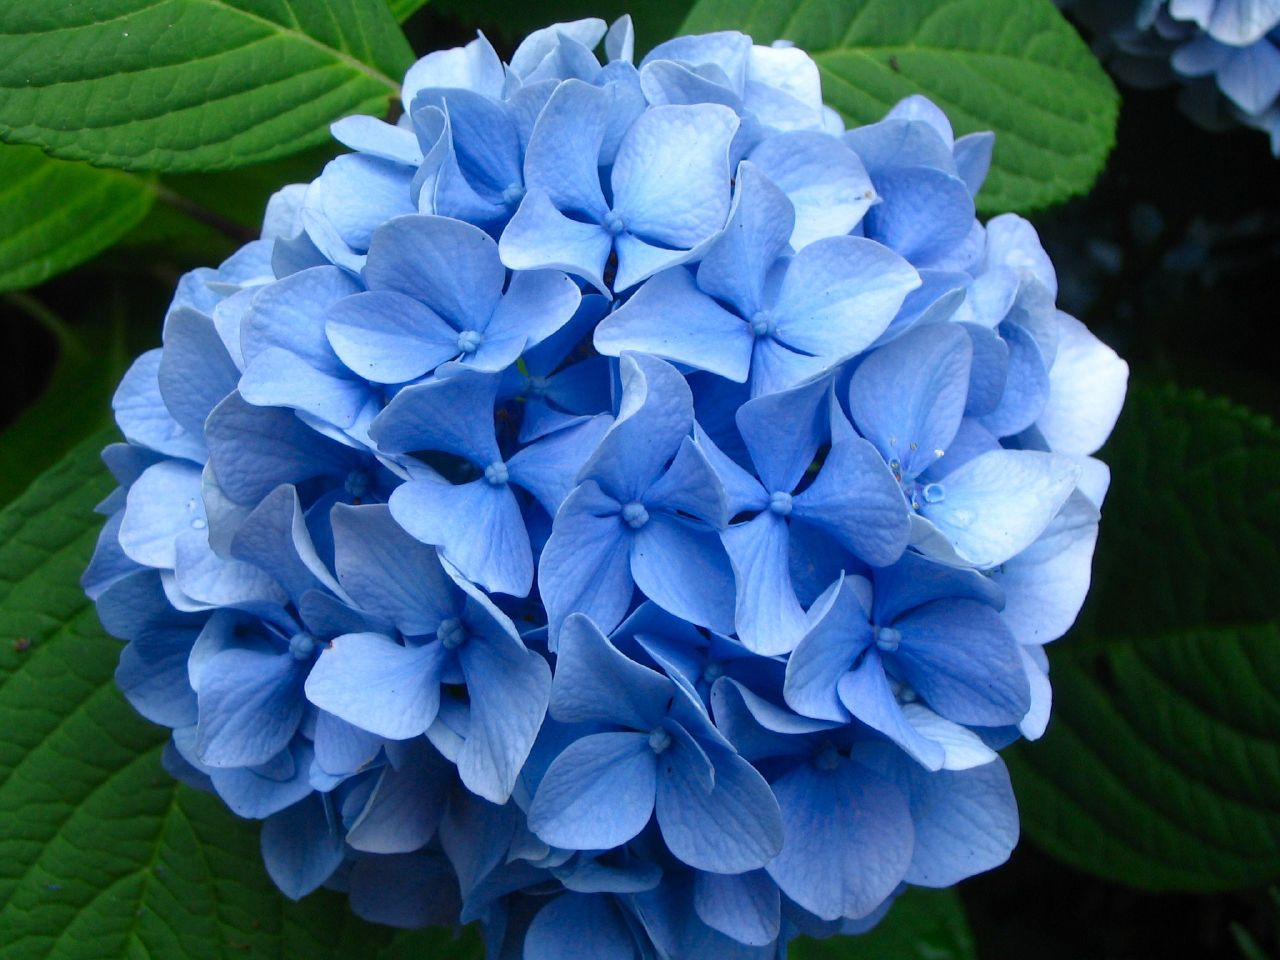 Dr. Dan's Garden Tips: The Range Of Hydrangea